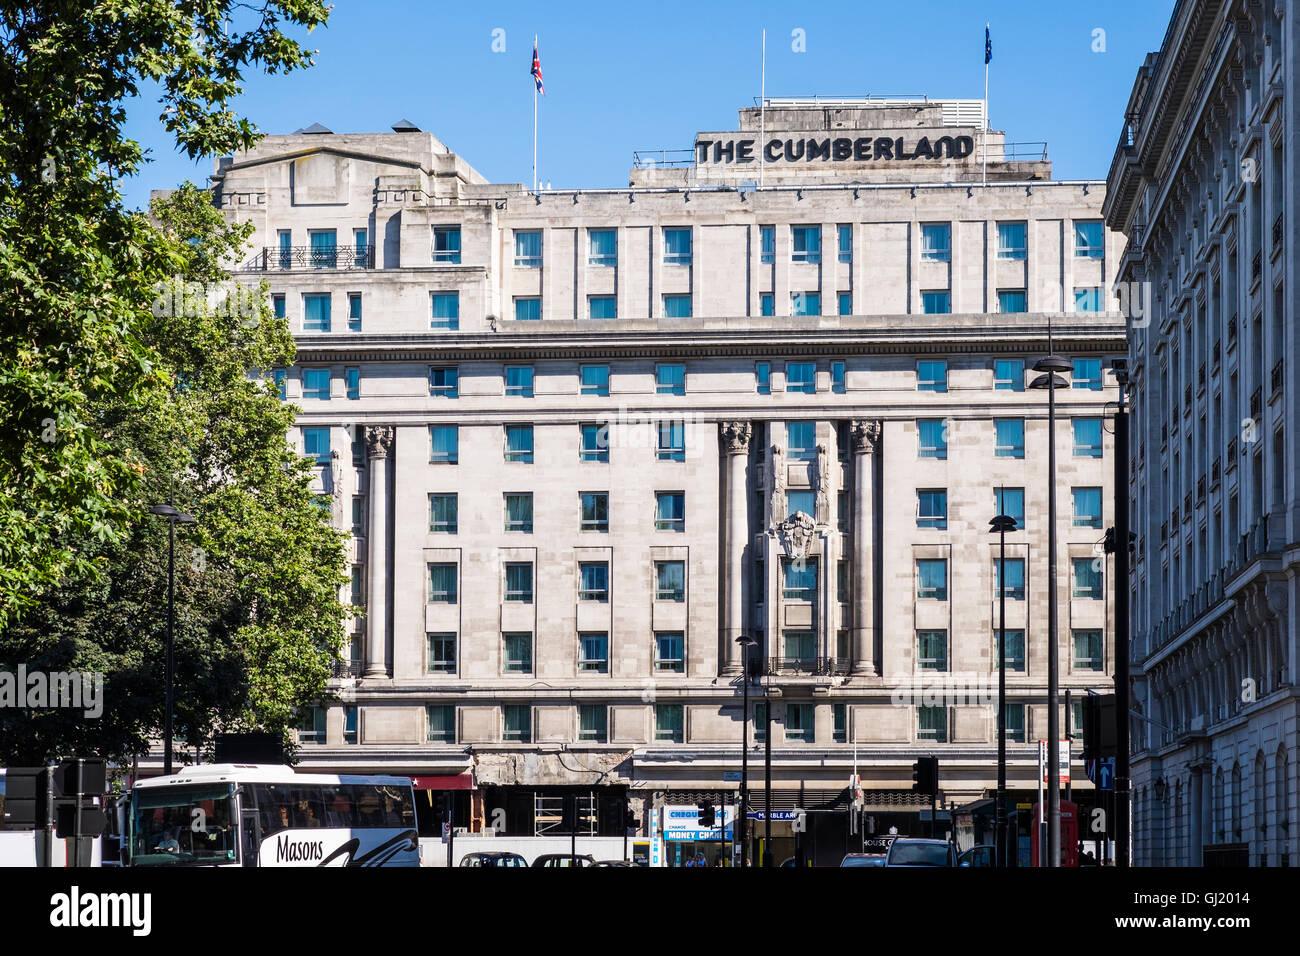 The Cumberland Hotel London Uk